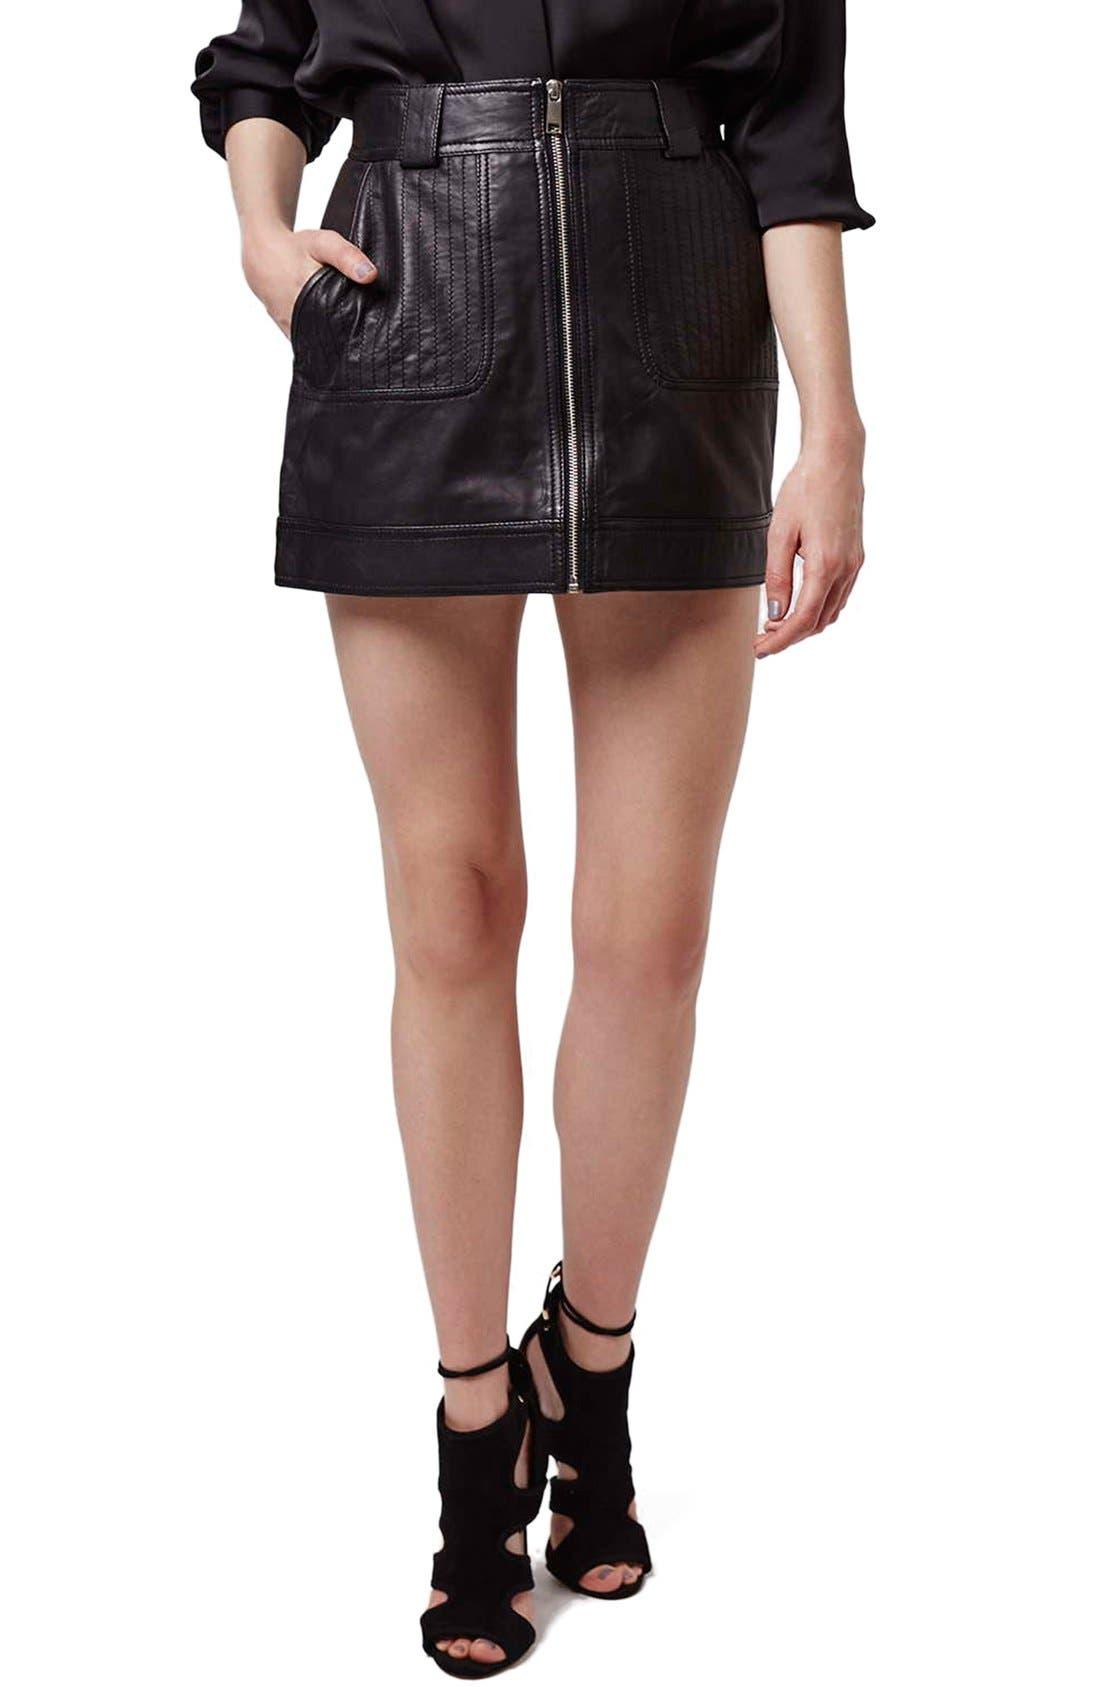 Alternate Image 1 Selected - Topshop Uber Leather Miniskirt